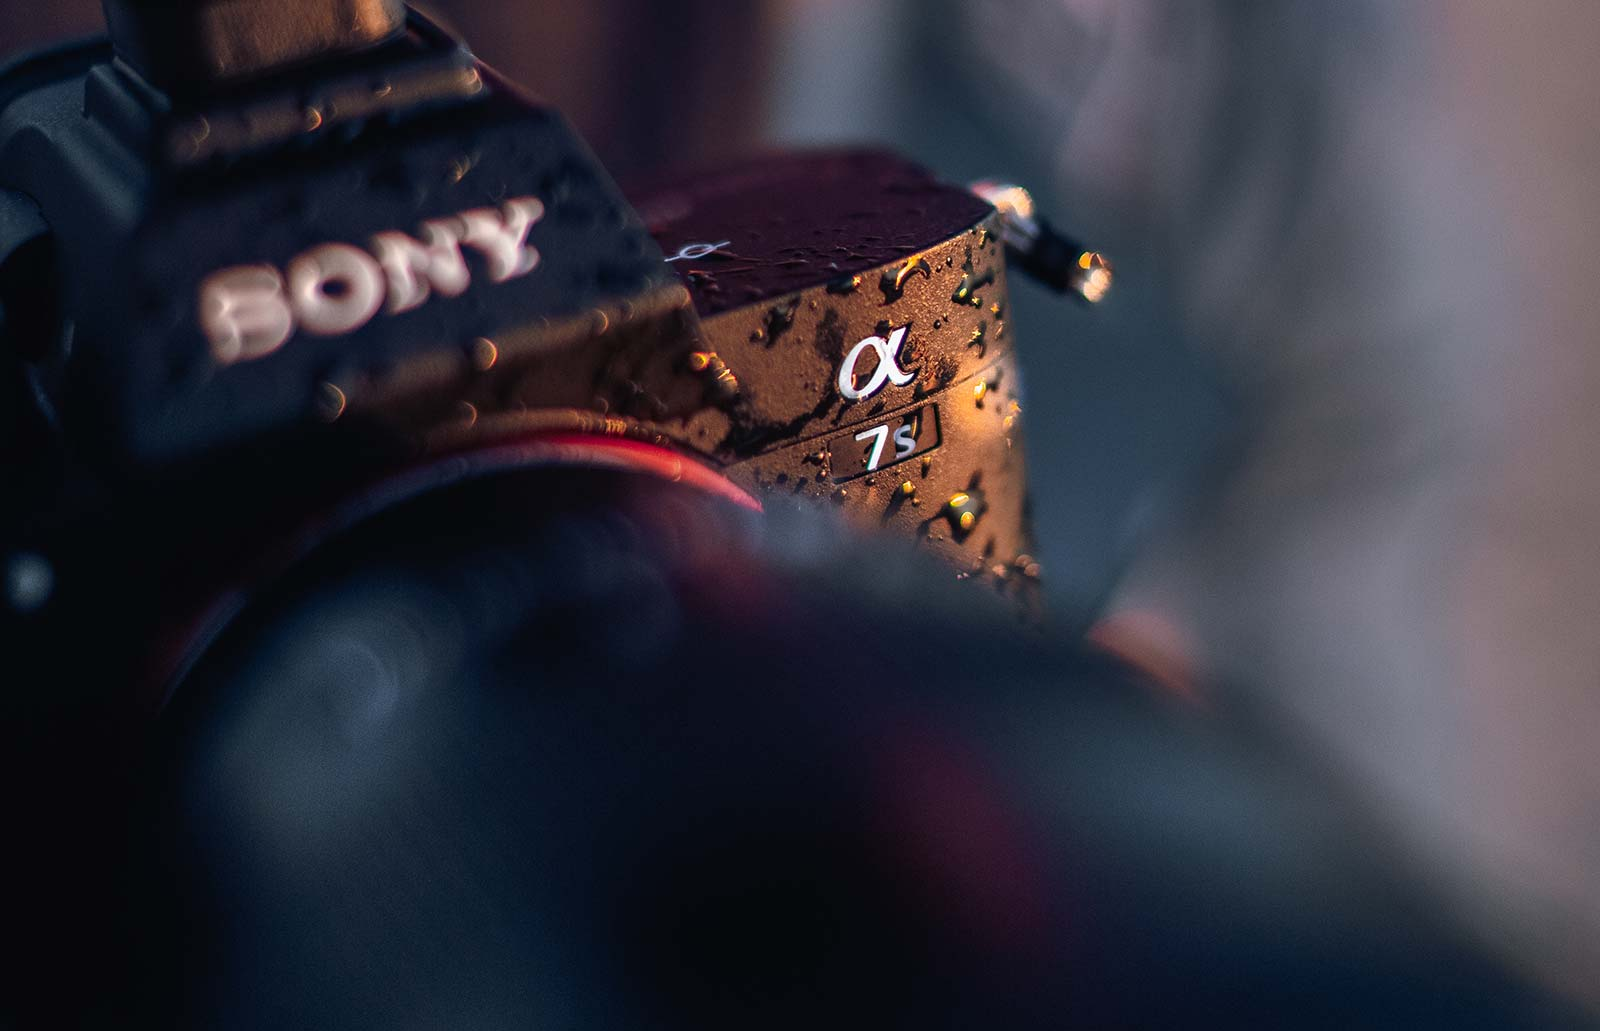 Sony bolsters stills video capabilities in A7s III – Pickr